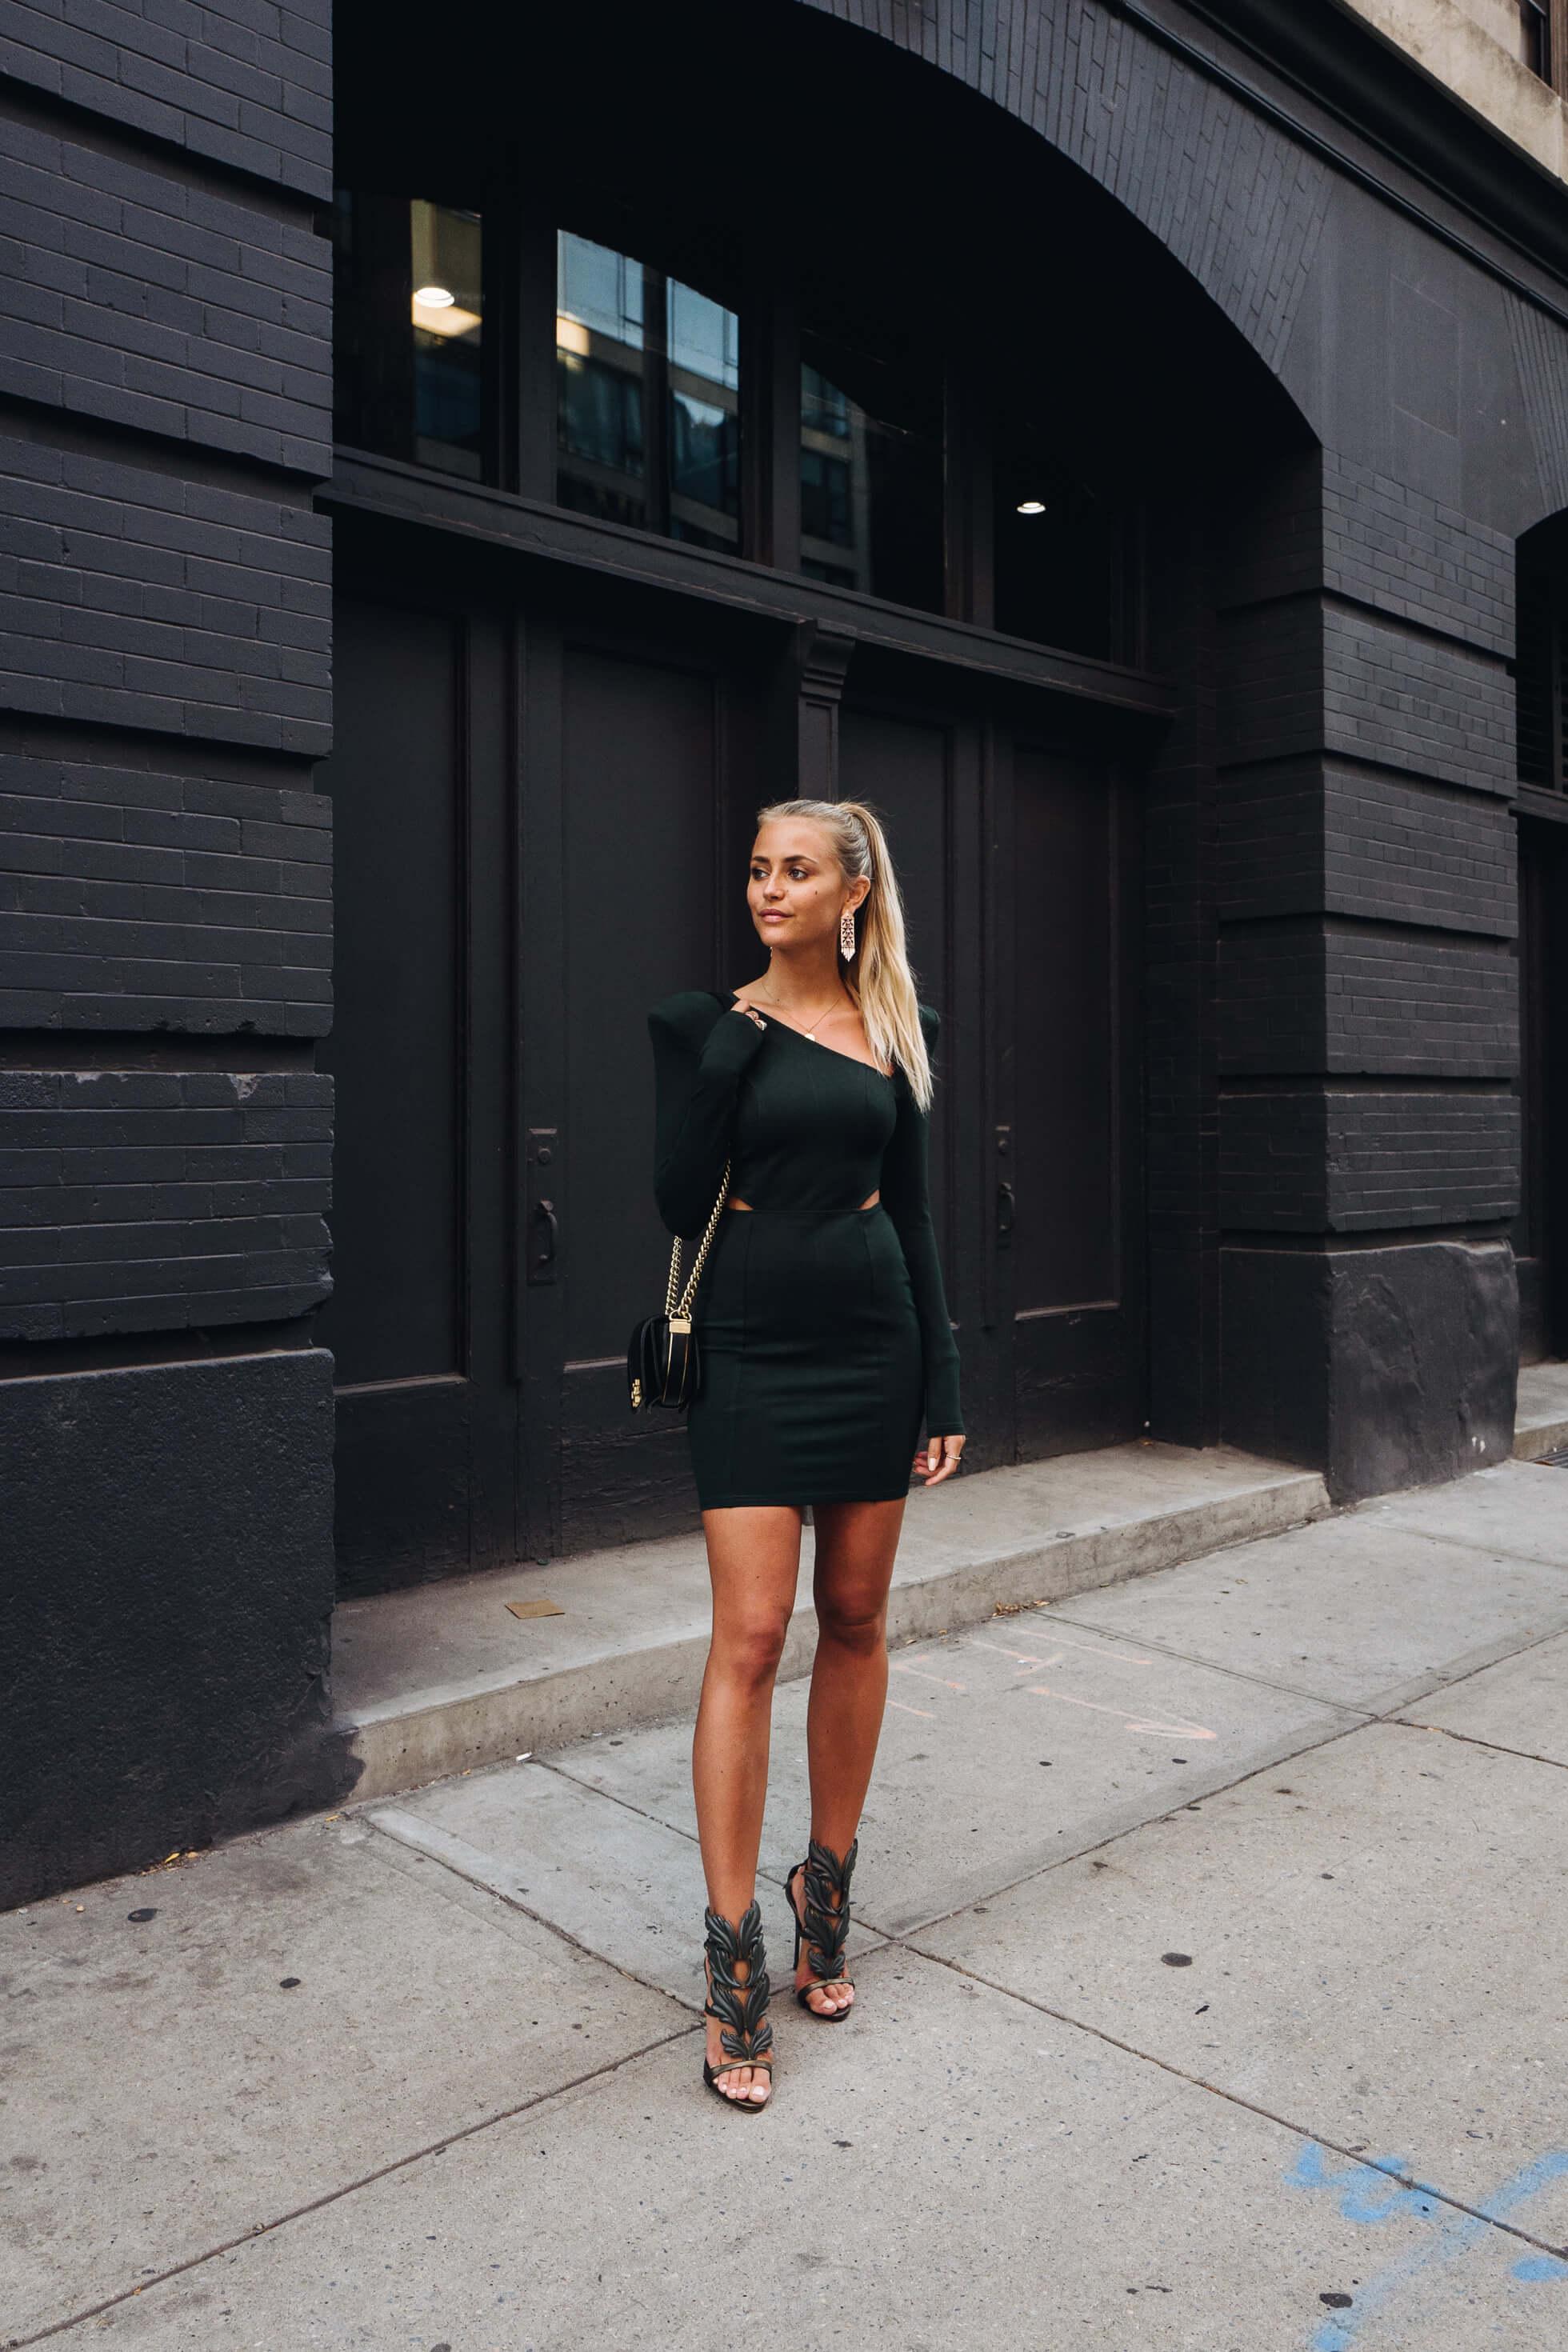 janni-deler-green-dressL1090635-Redigera